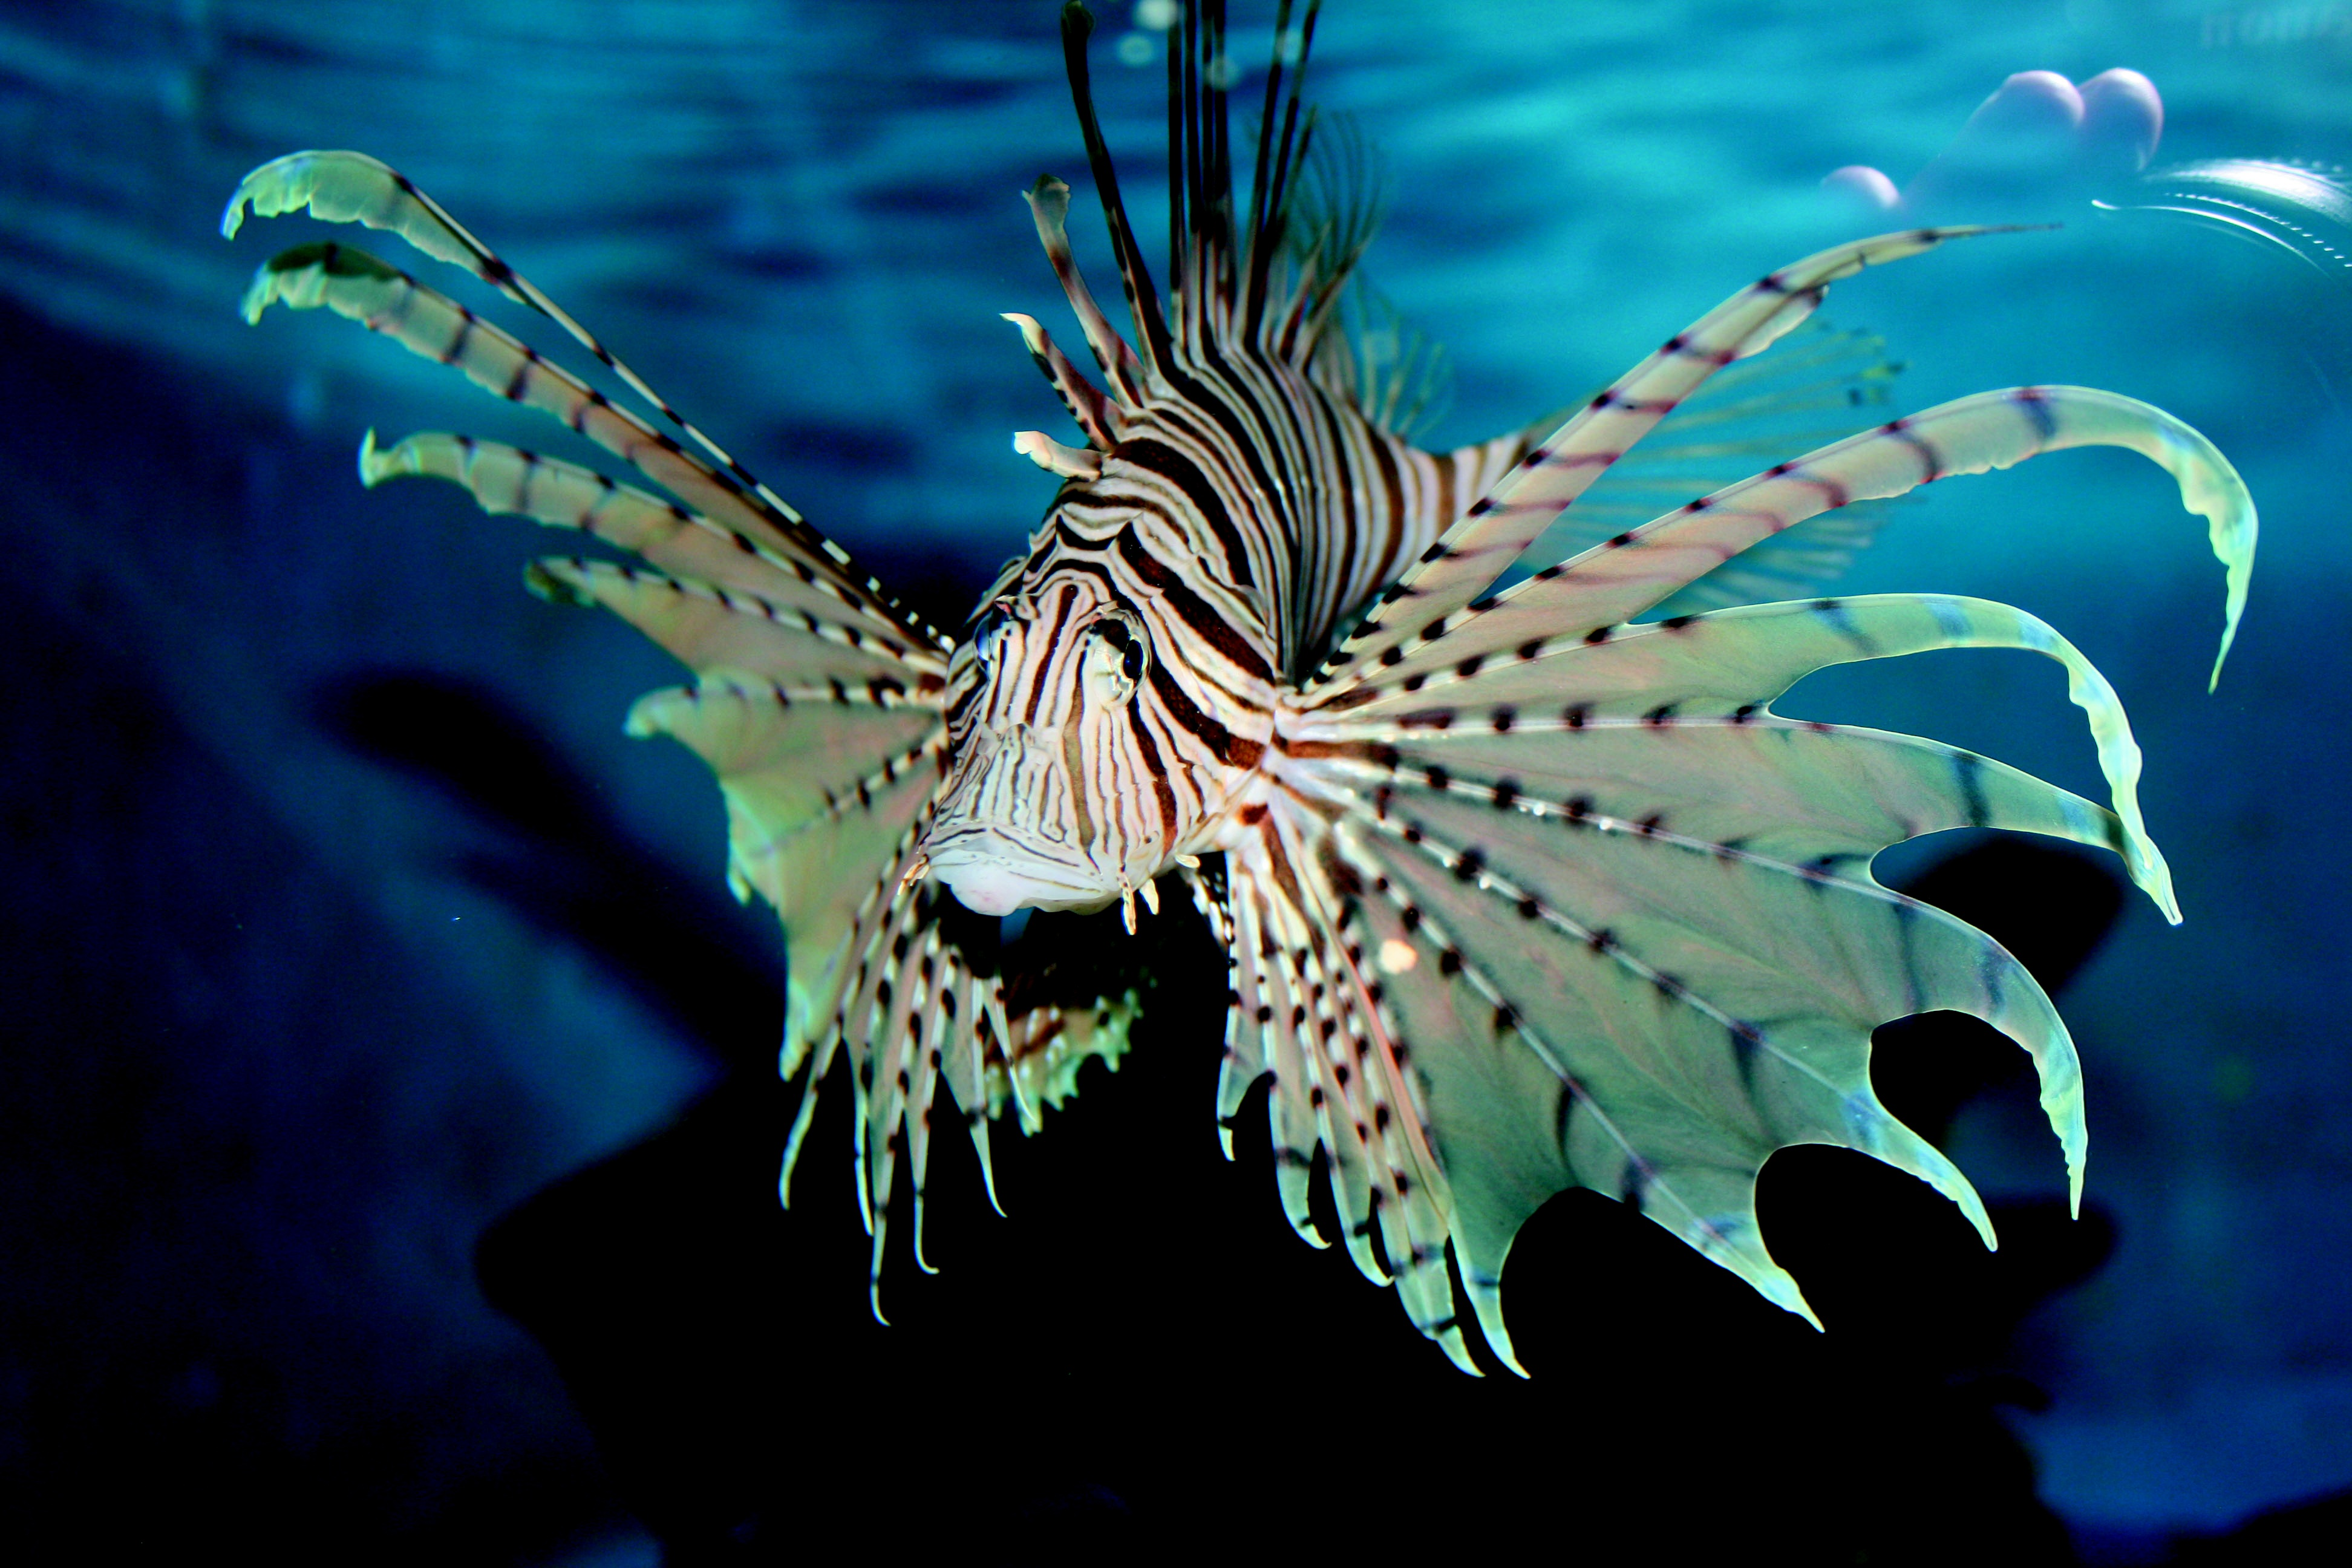 Pterois Volitans, Pez León, acuario, veneno, mar Caibe, expansión, biología